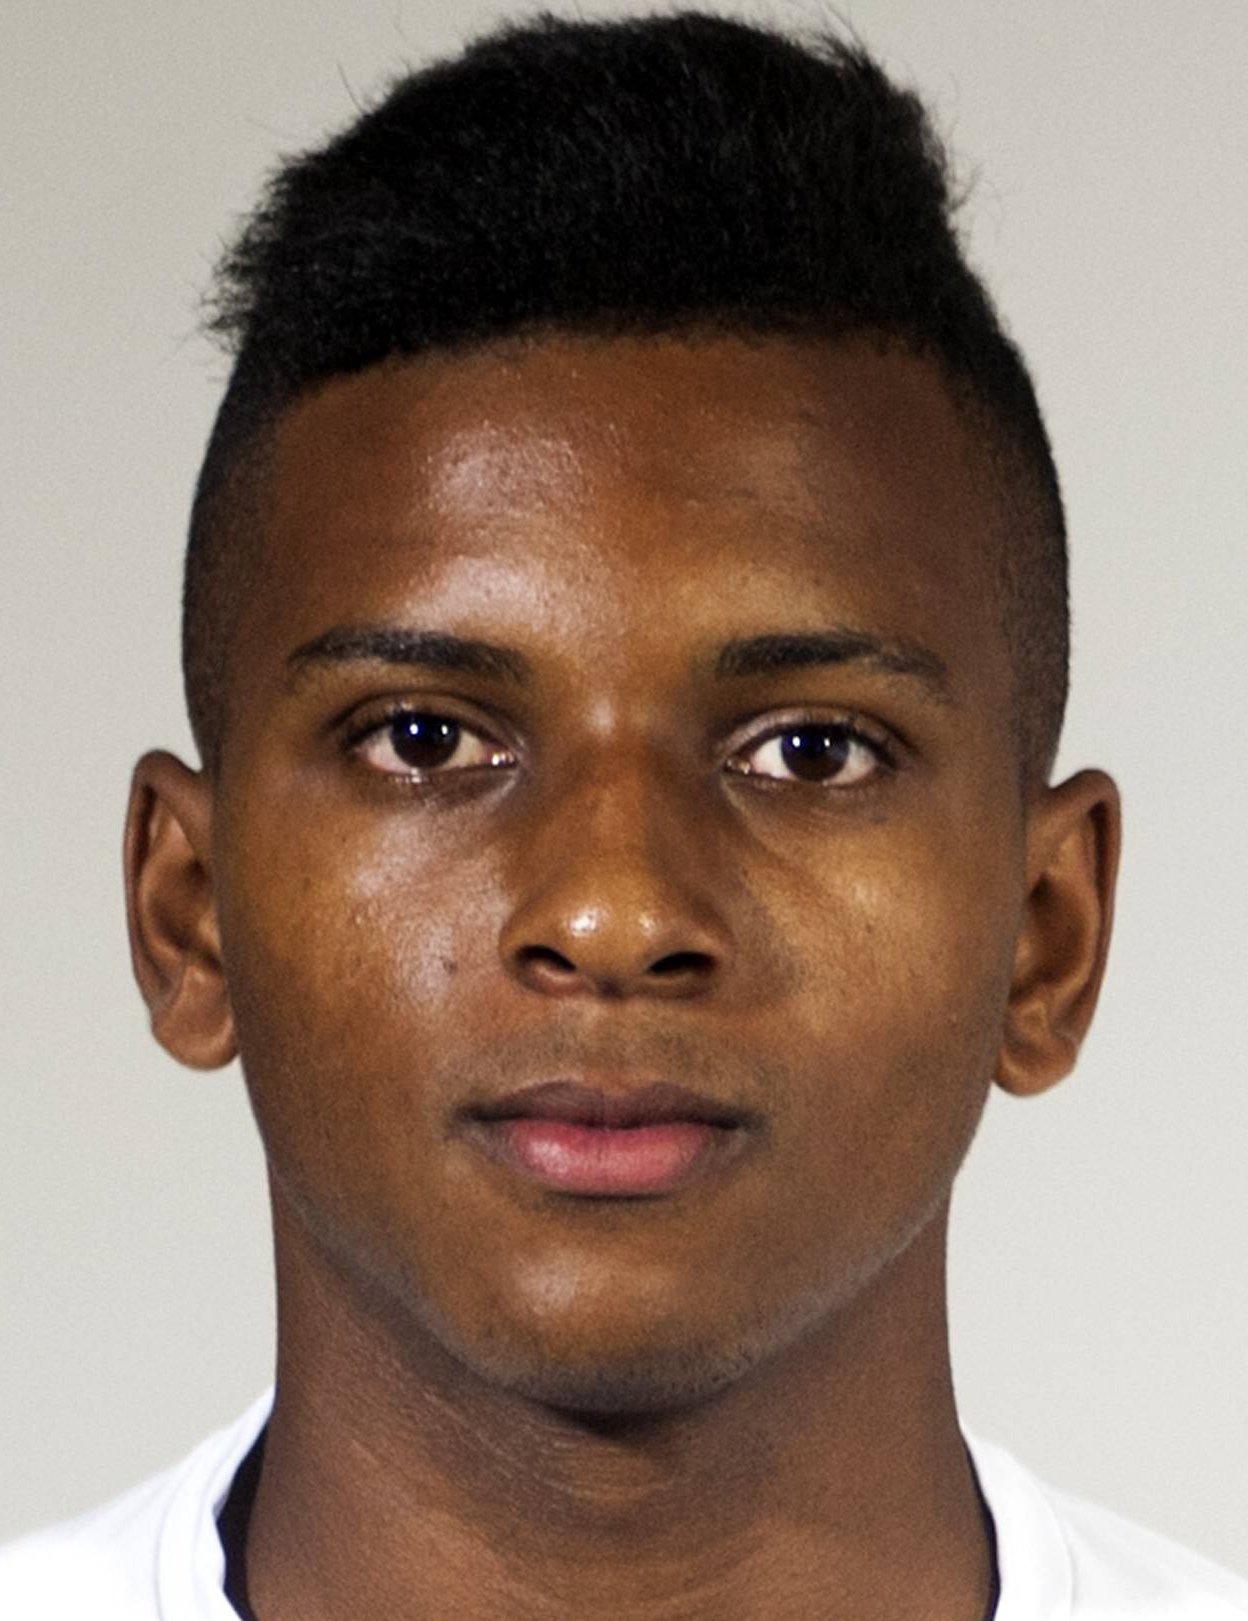 Rodrygo-Silva-de-Goes-Face-Shape